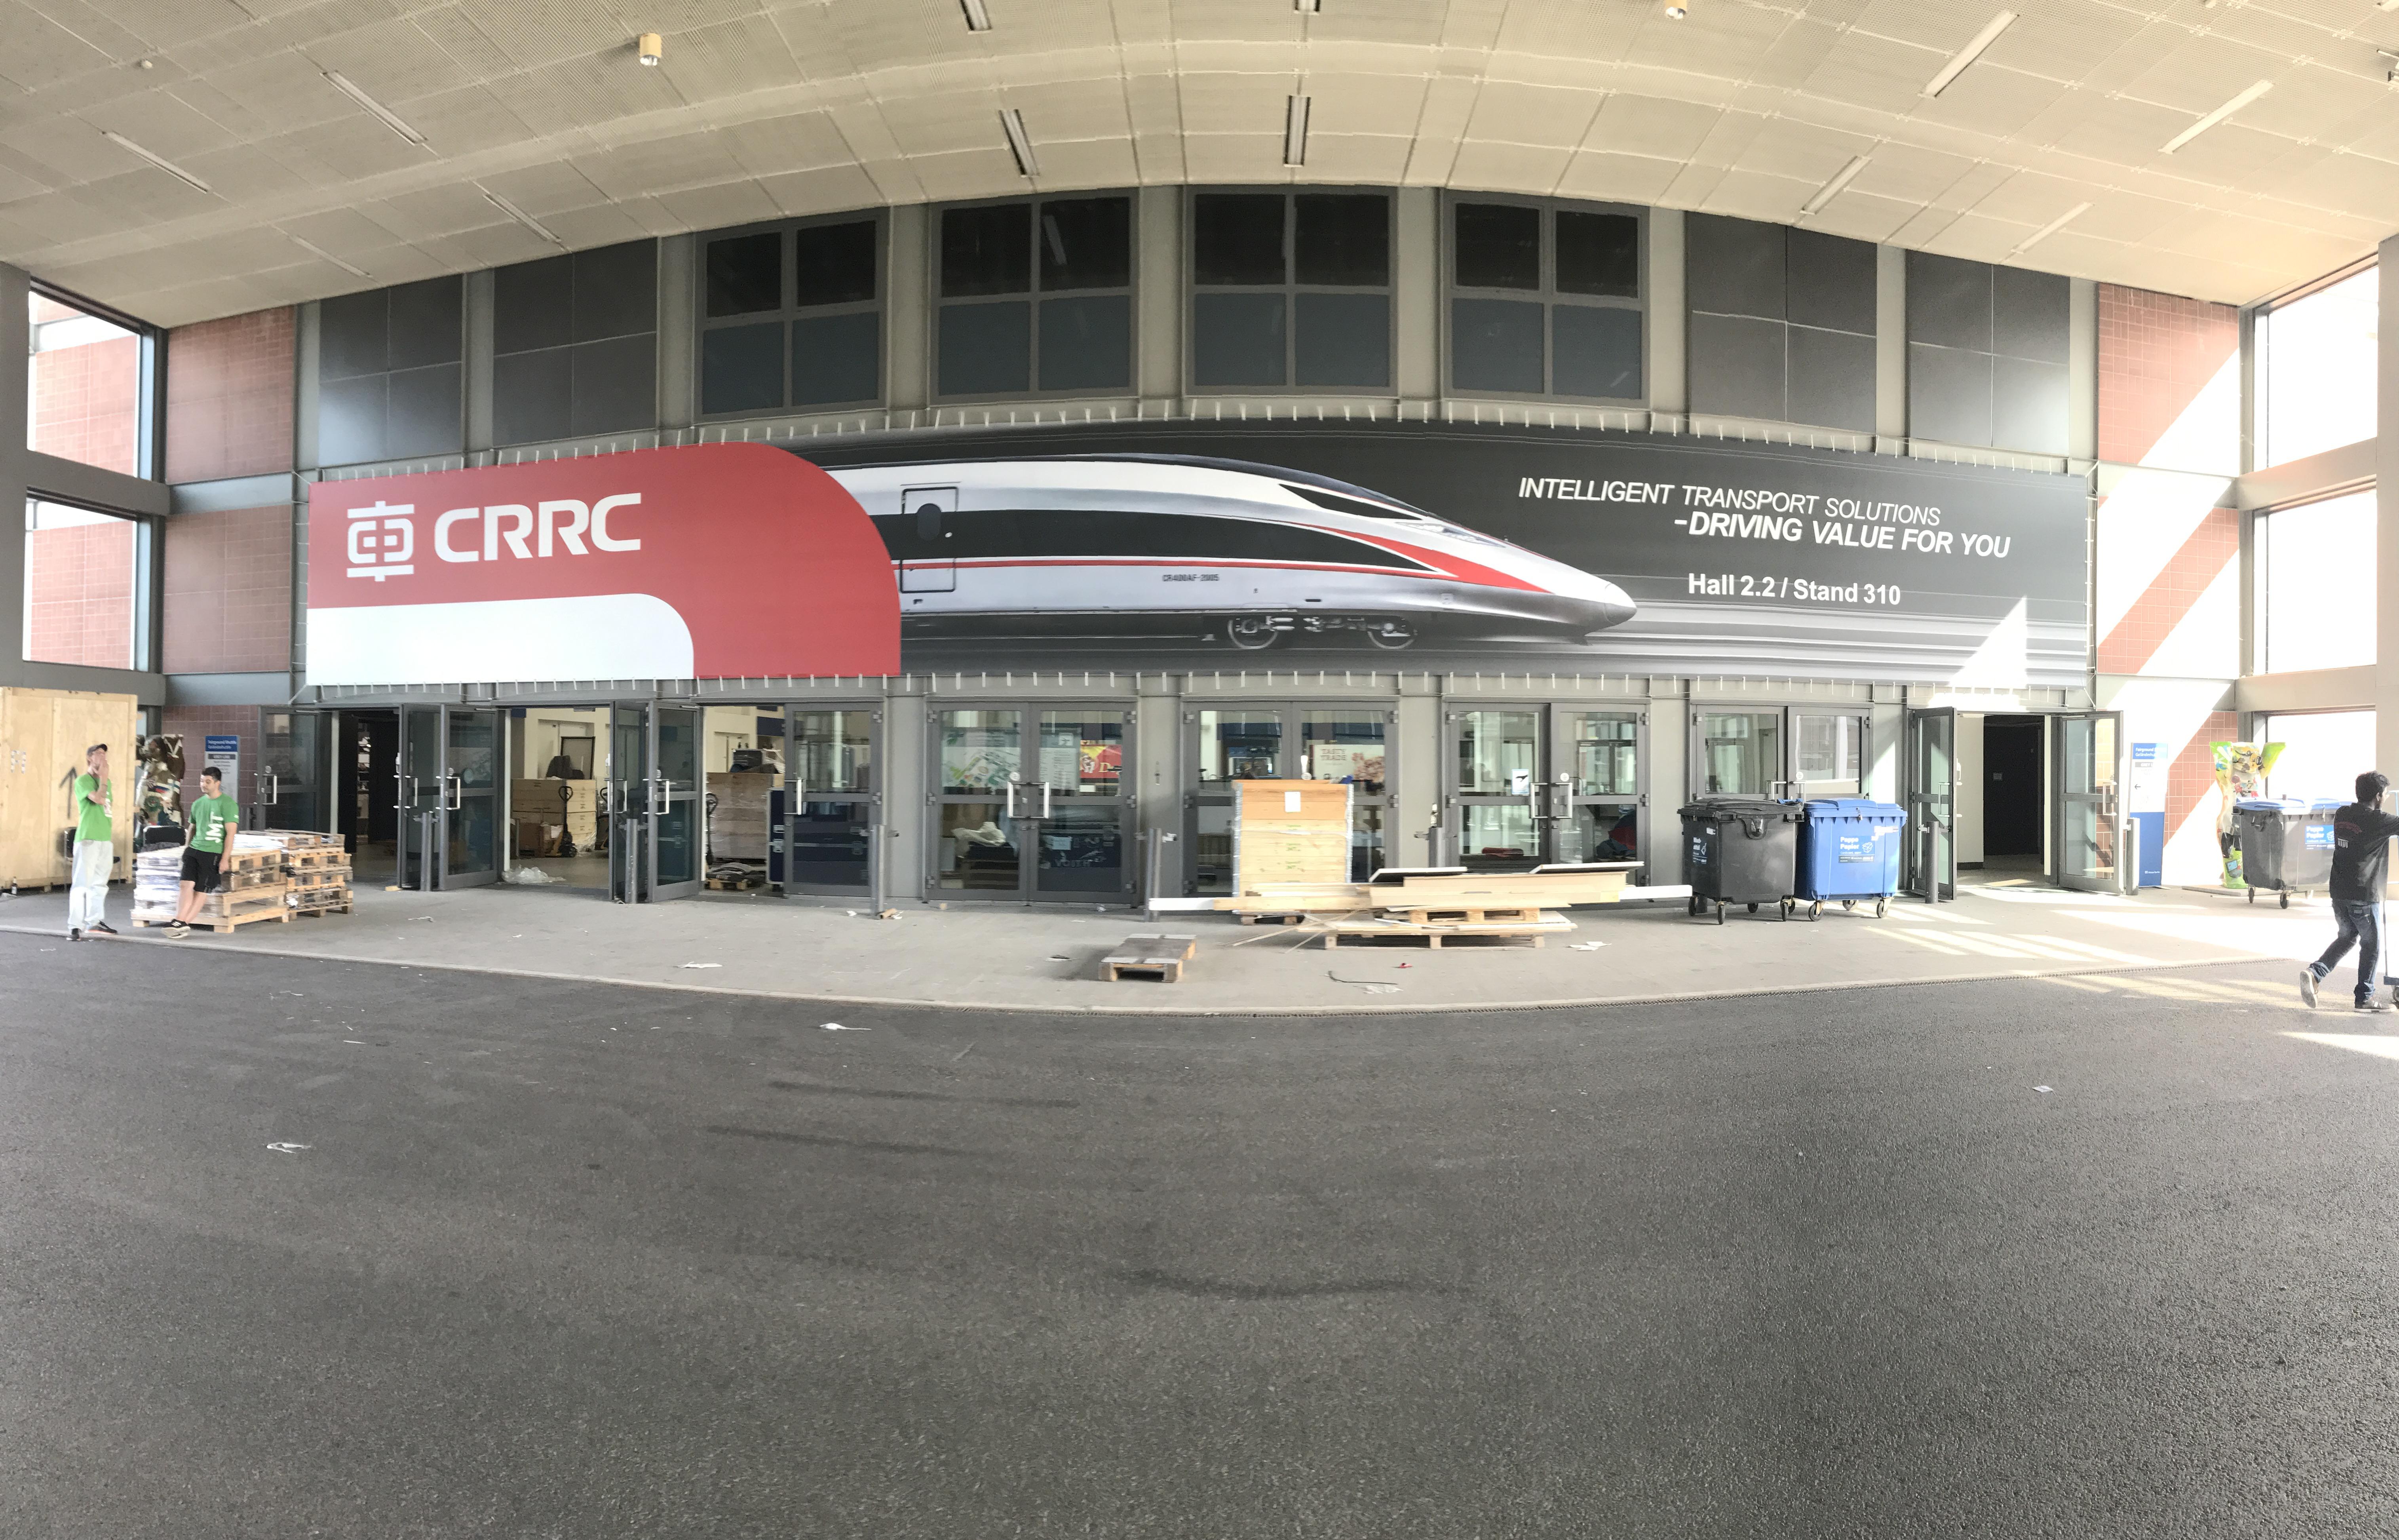 Innotrans 2018, Banner CRRC Corporation, zdroj: Zdopravy.cz/Josef Petrák